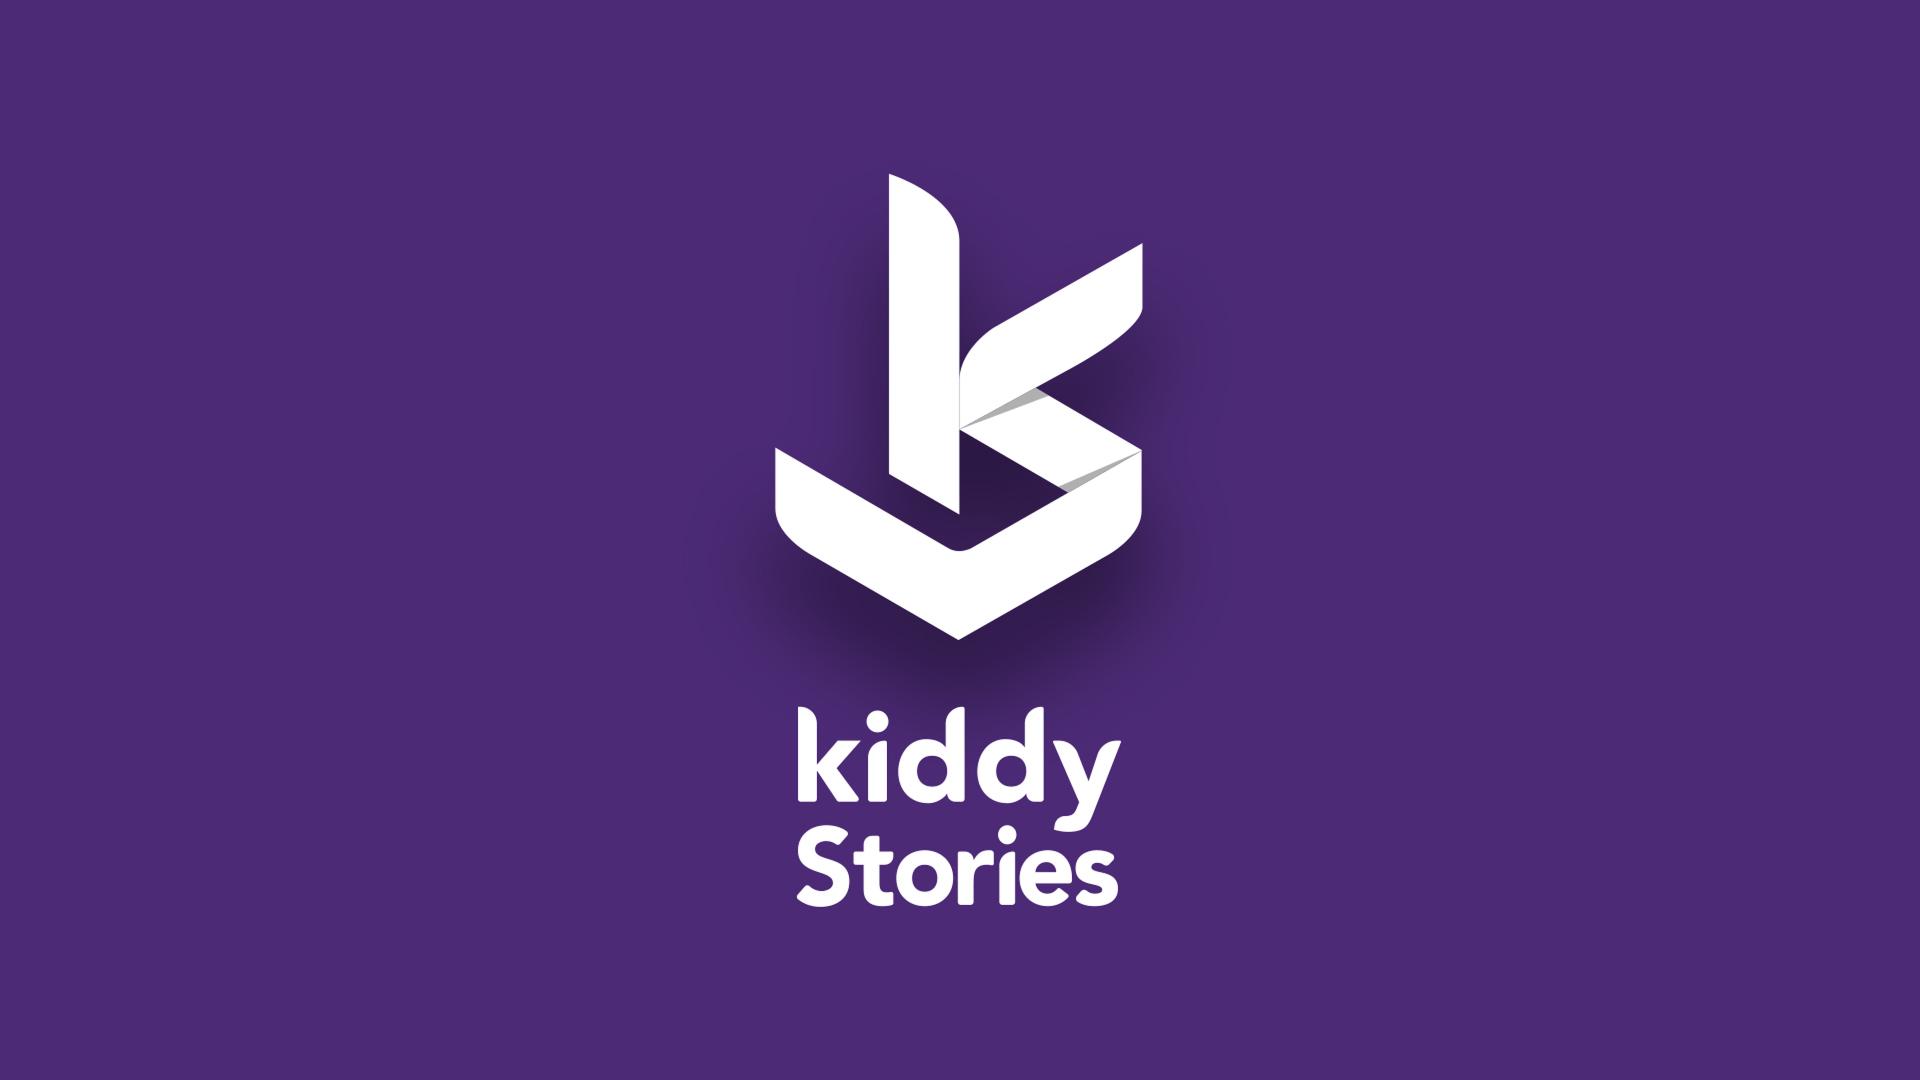 Kiddy Stories